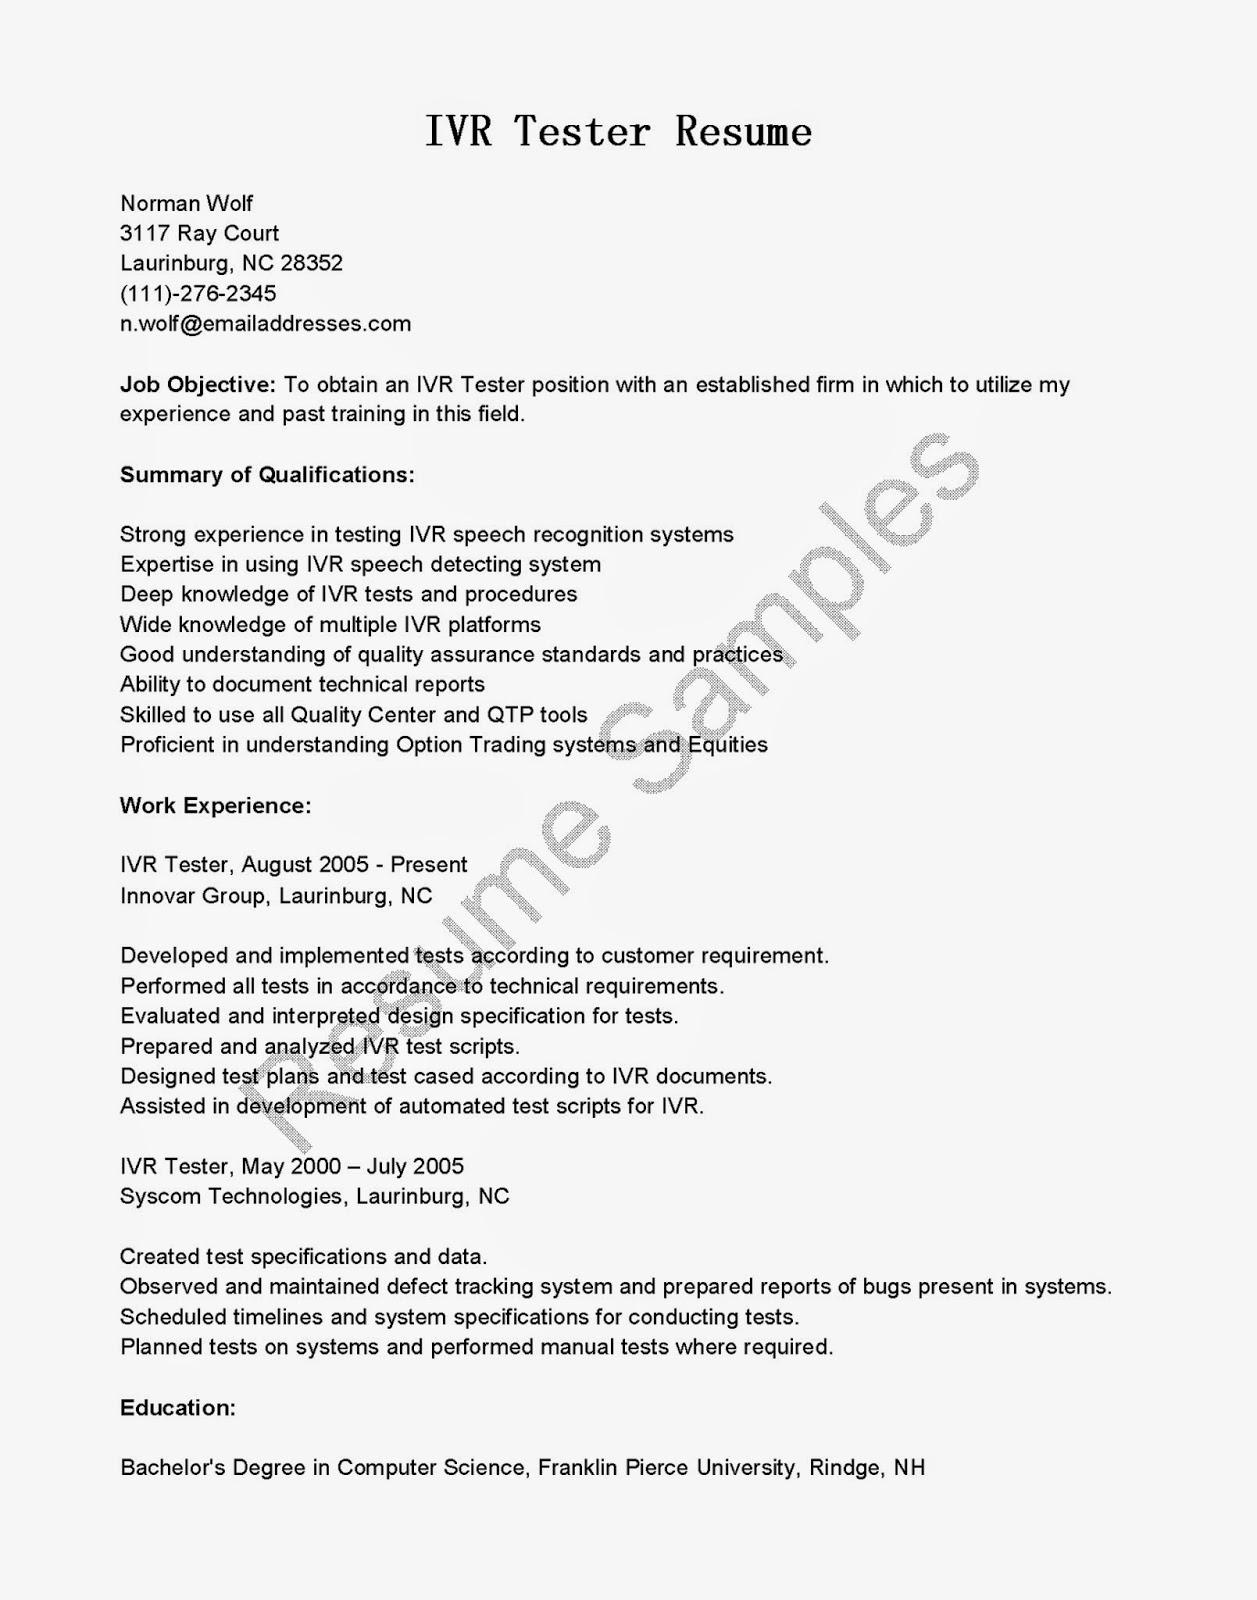 resume samples  ivr tester resume sample